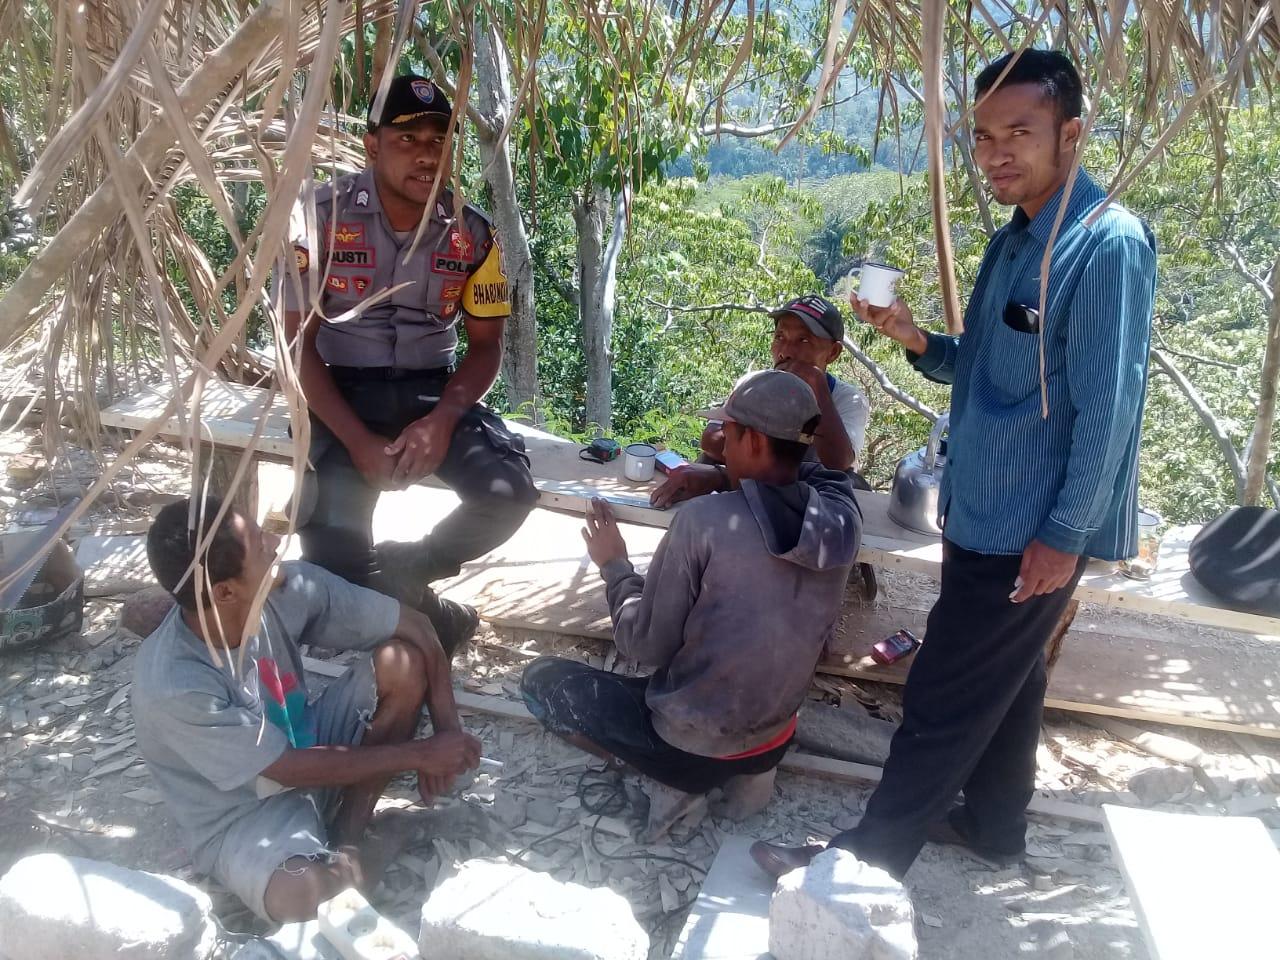 Patroli dan Sambang | Bhabinkamtibmas Desa Golowoi, titip pesan Kamtibmas